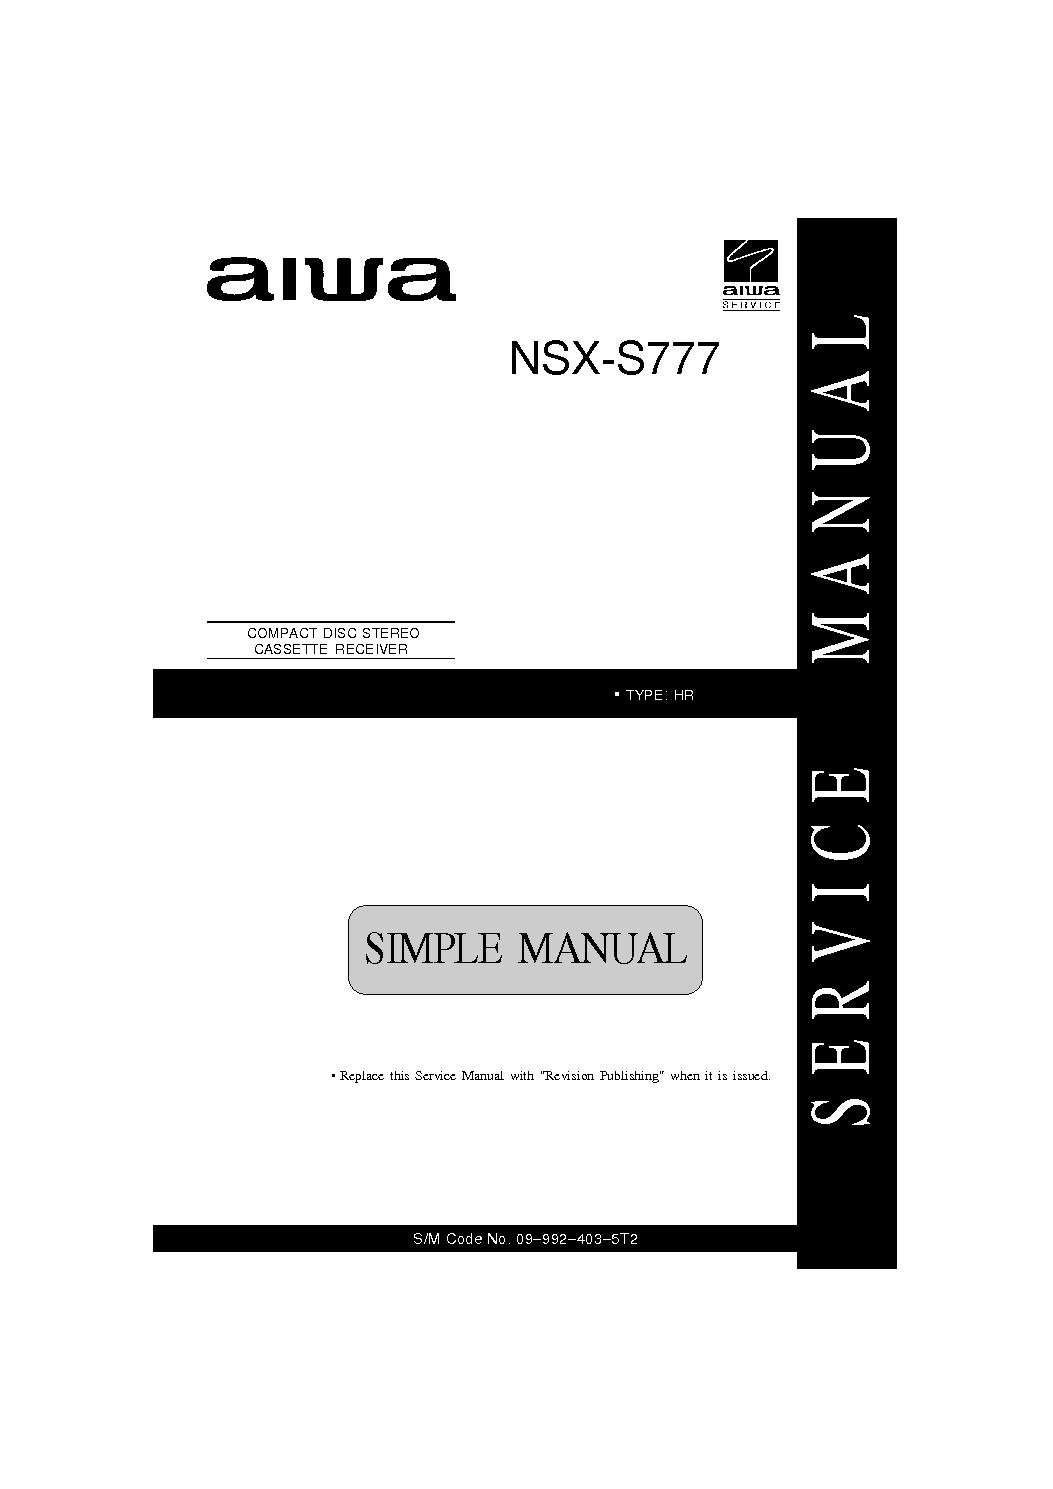 AIWA NSX-S777 service manual (1st page)